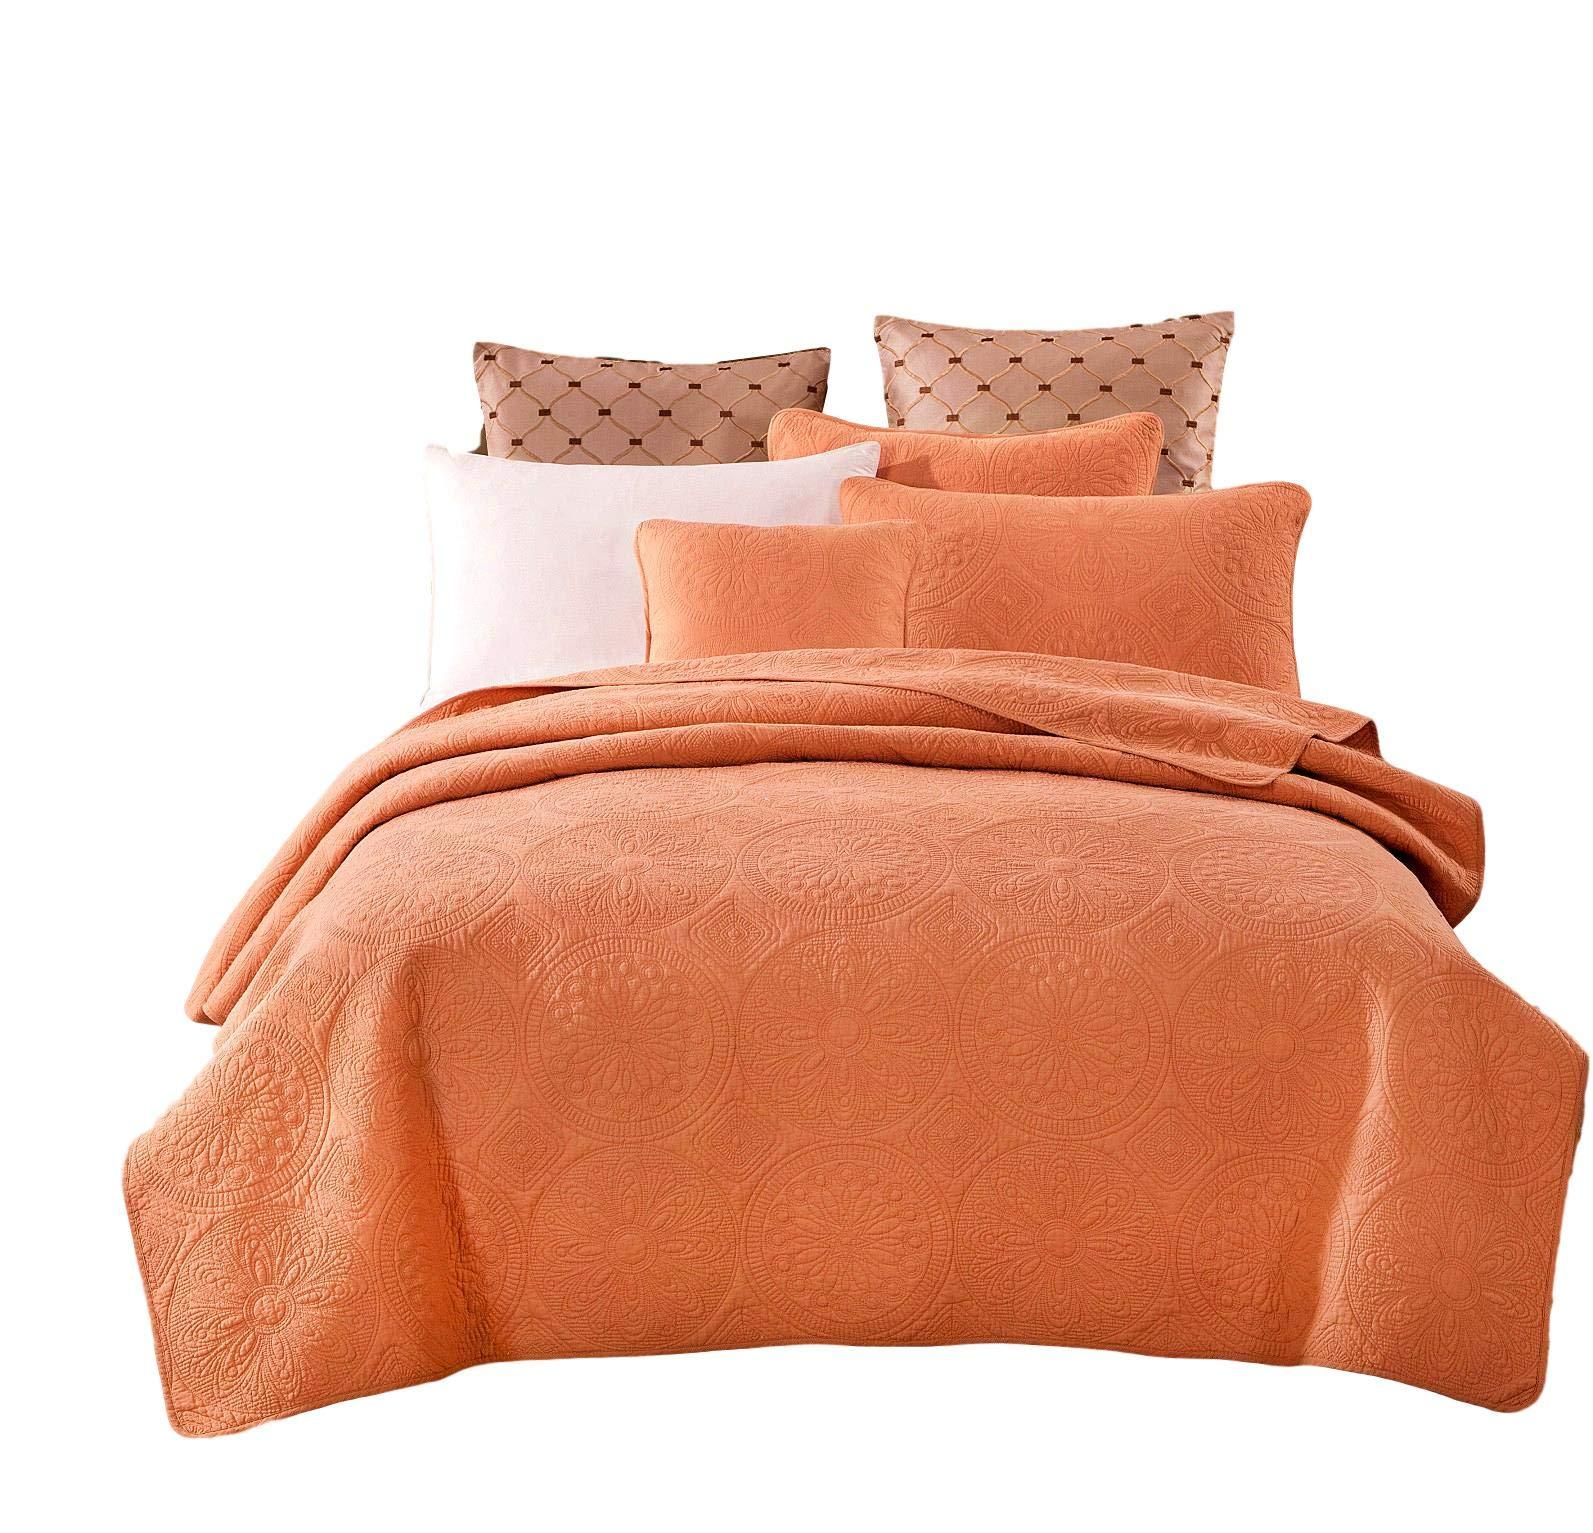 Tache Cotton Matelasse Orange Bedspread - Fall Harvest Solid Quilt Coverlet Set, 2 Piece, Twin